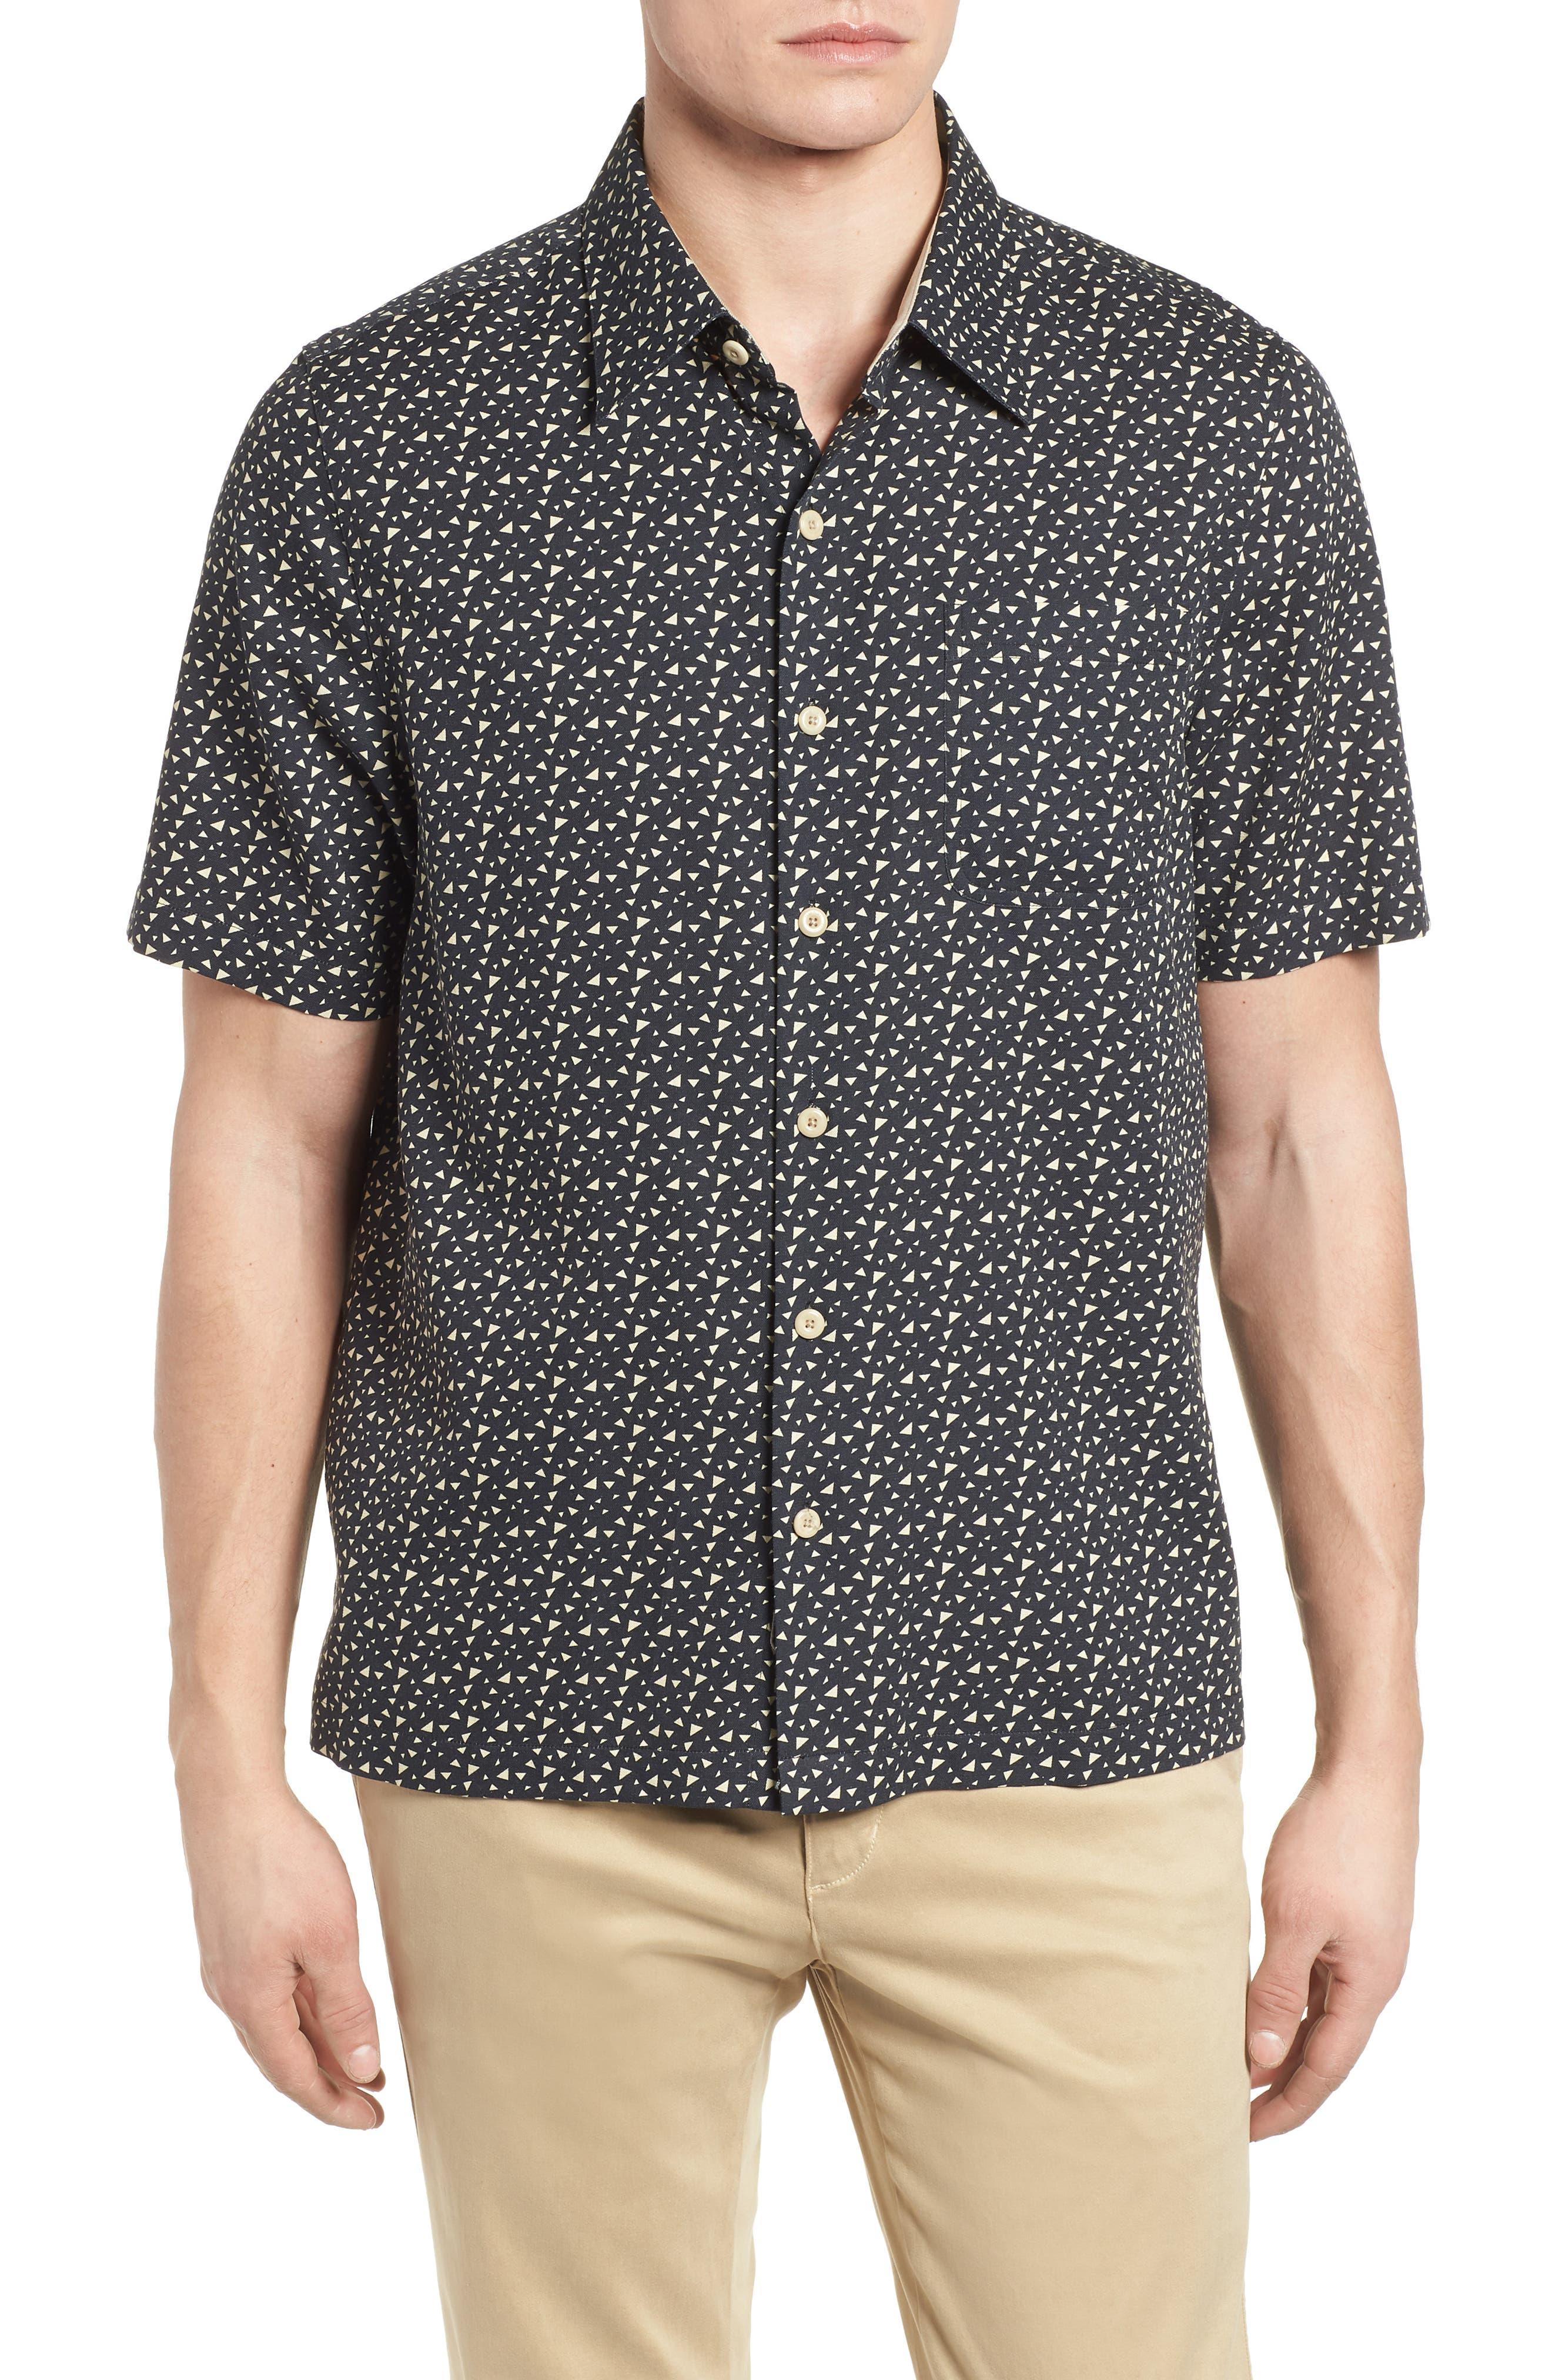 NAT NAST Bermuda Triangle Camp Shirt, Main, color, 001